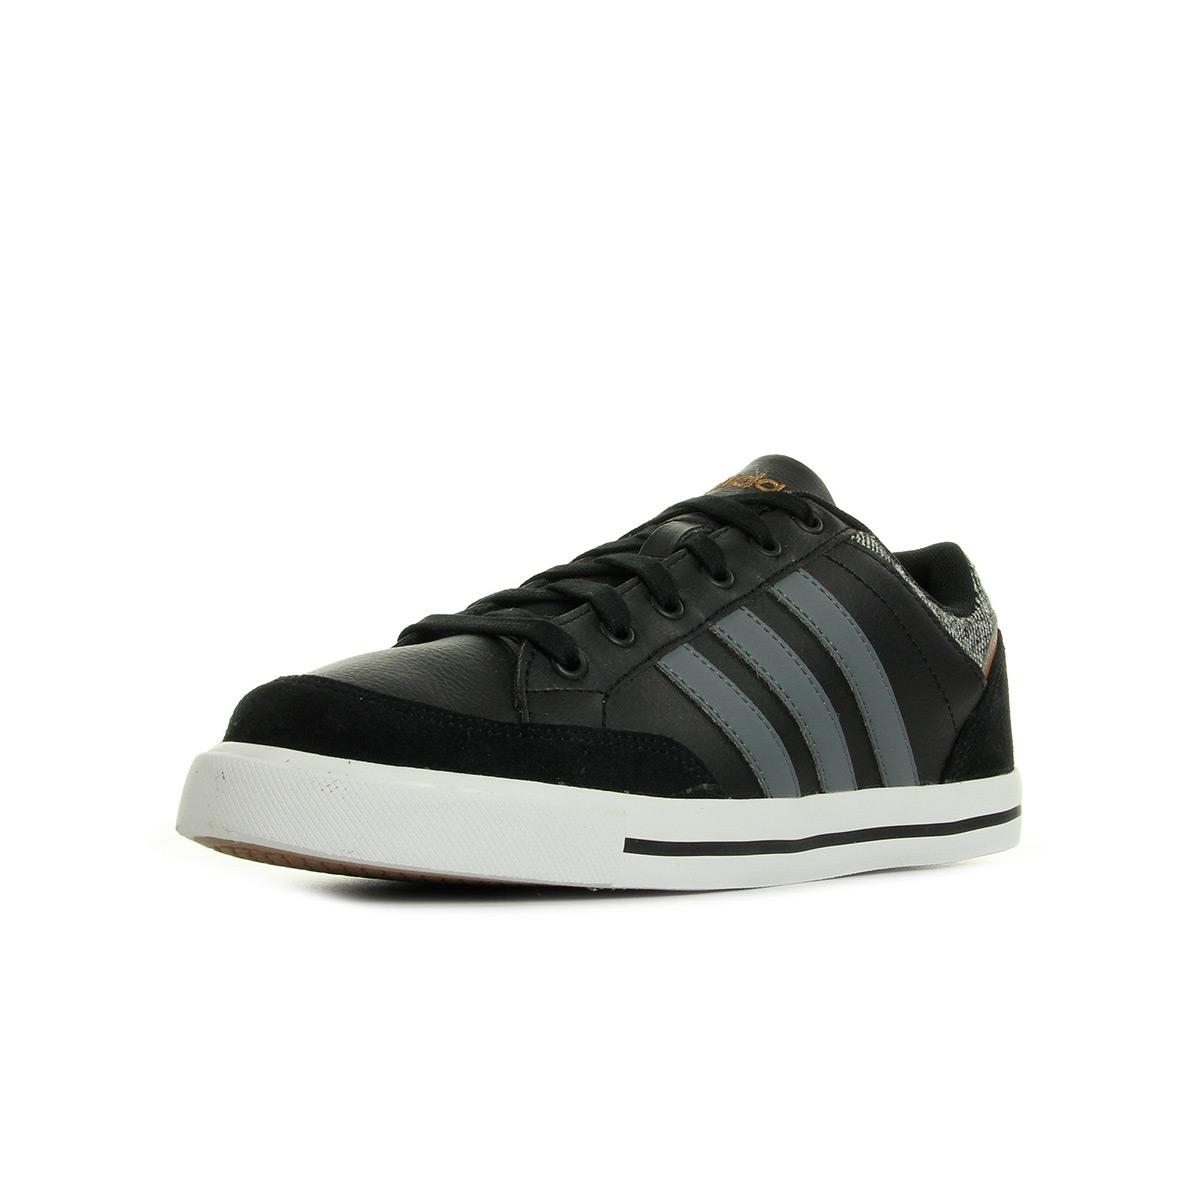 Adidas Neo Cacity Homme